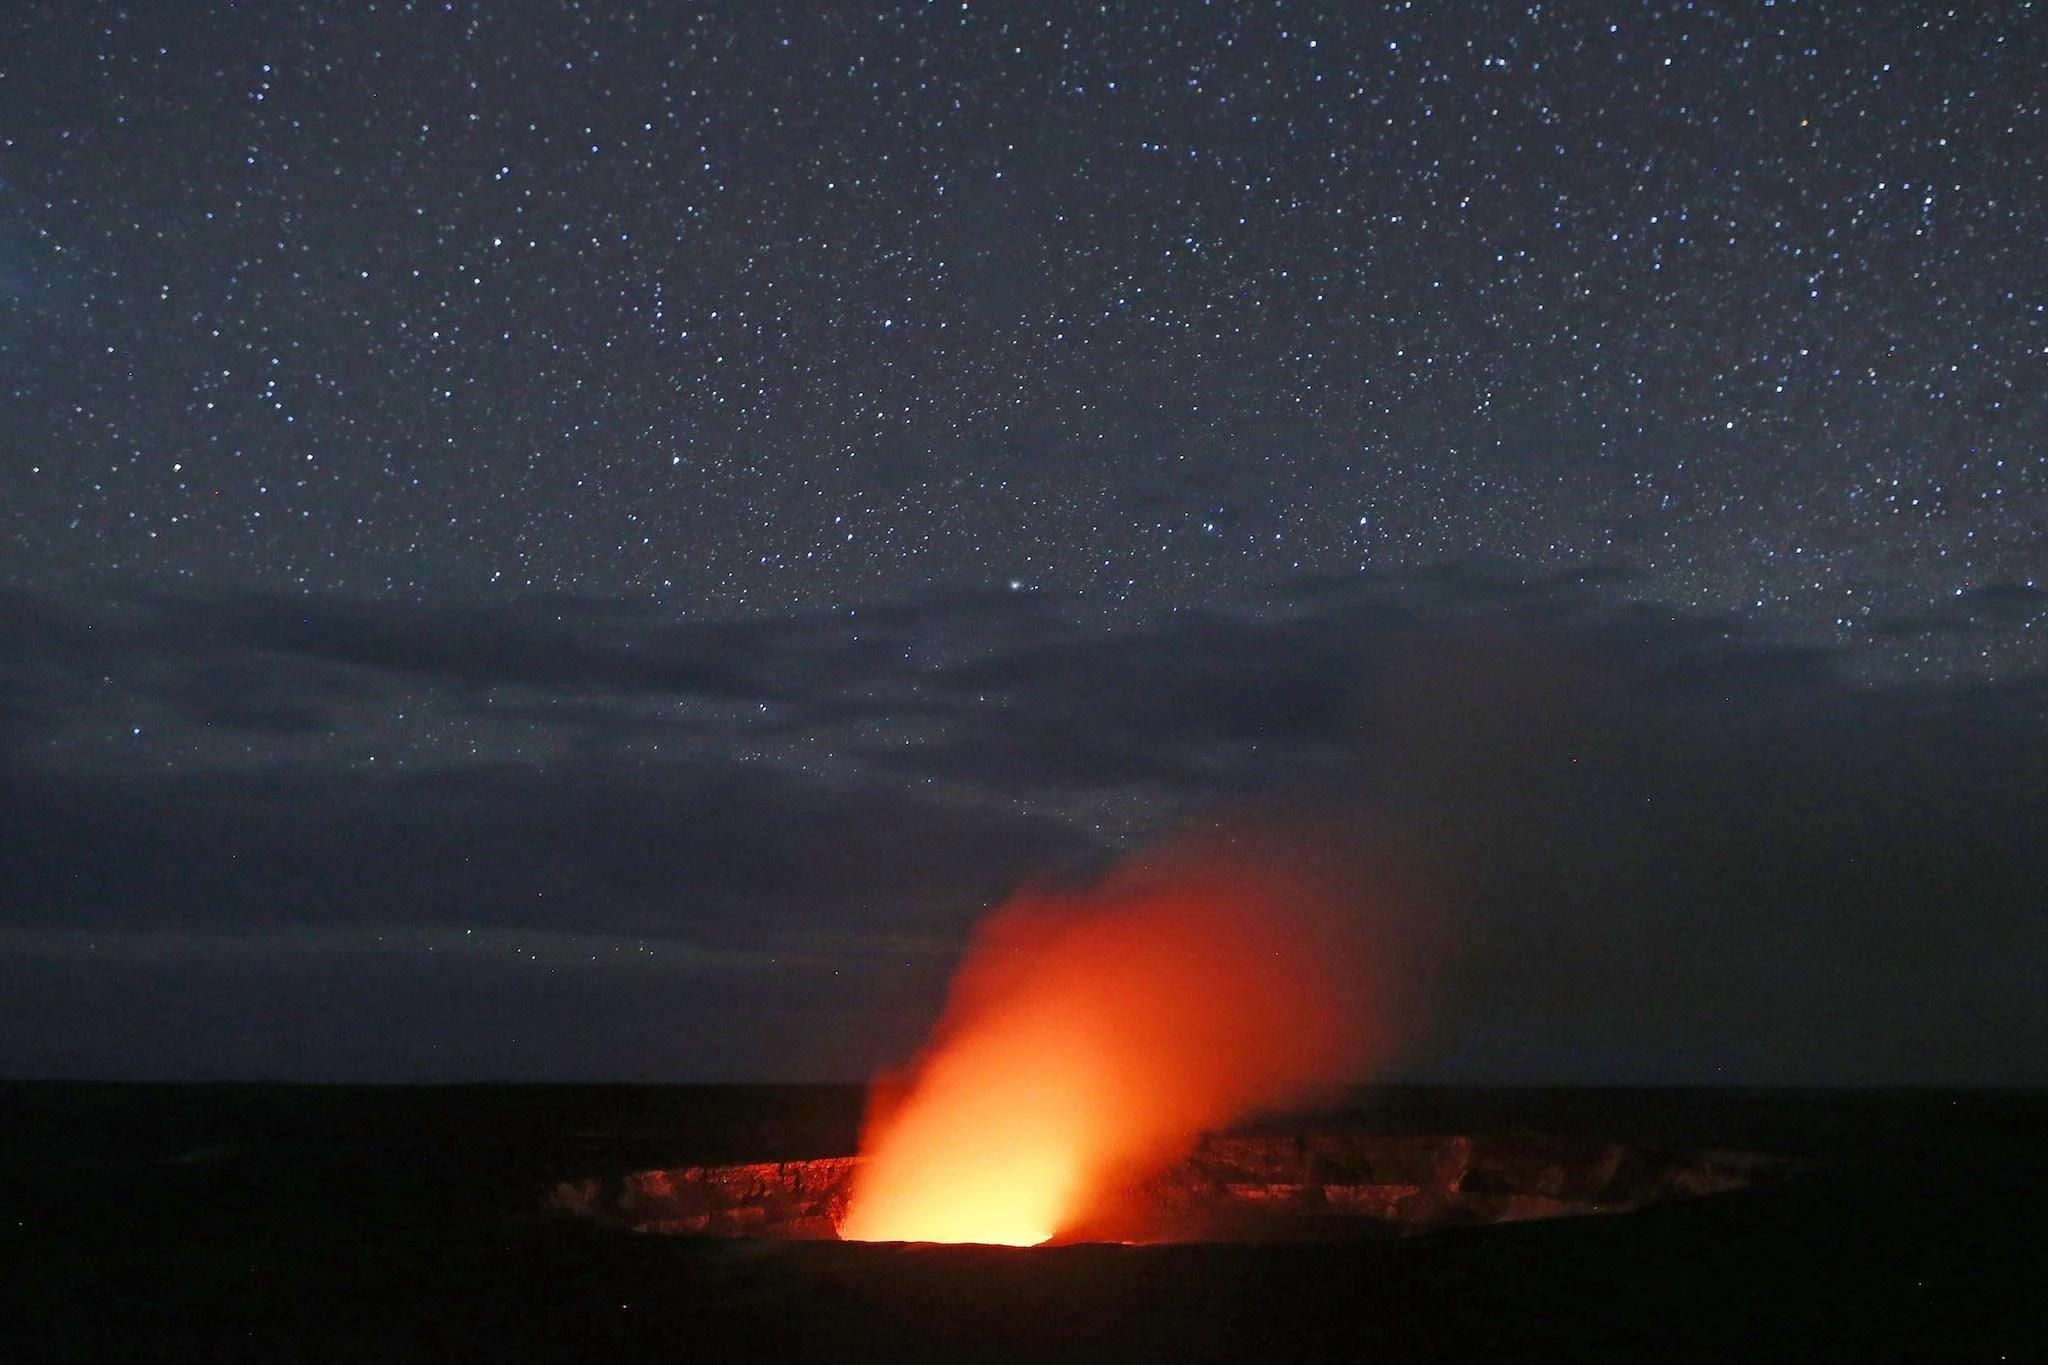 Hawaii Volcano 3d Video Shows Stunning Size Of Huge Kilauea Lava Lake That Threatens Island